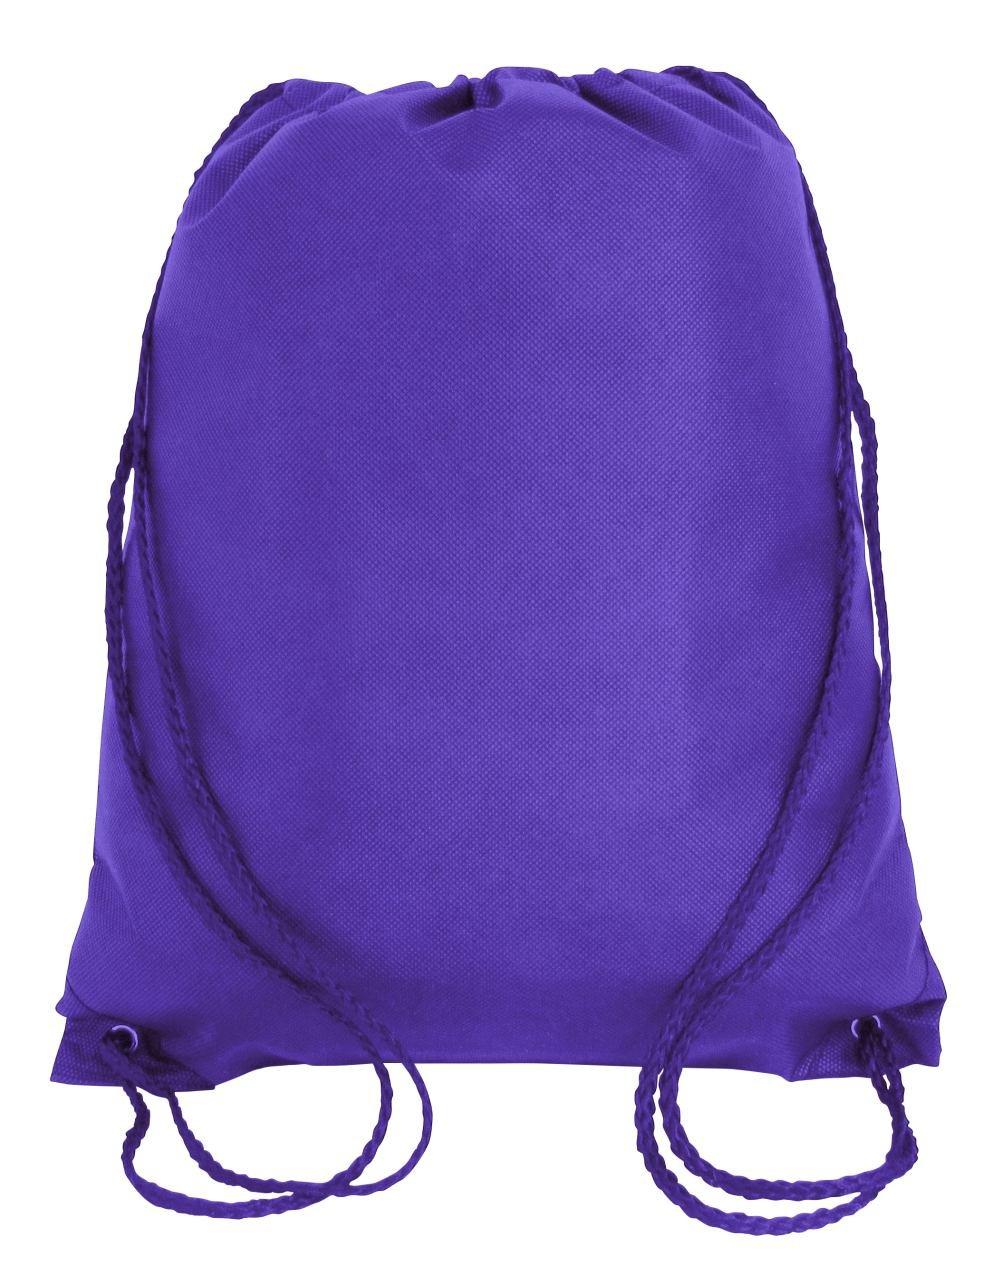 Bulk Drawstring Backpack Bags Sack Pack Cinch Tote Kids Sport Storage Bag for Gym Traveling (100, PURPLE)